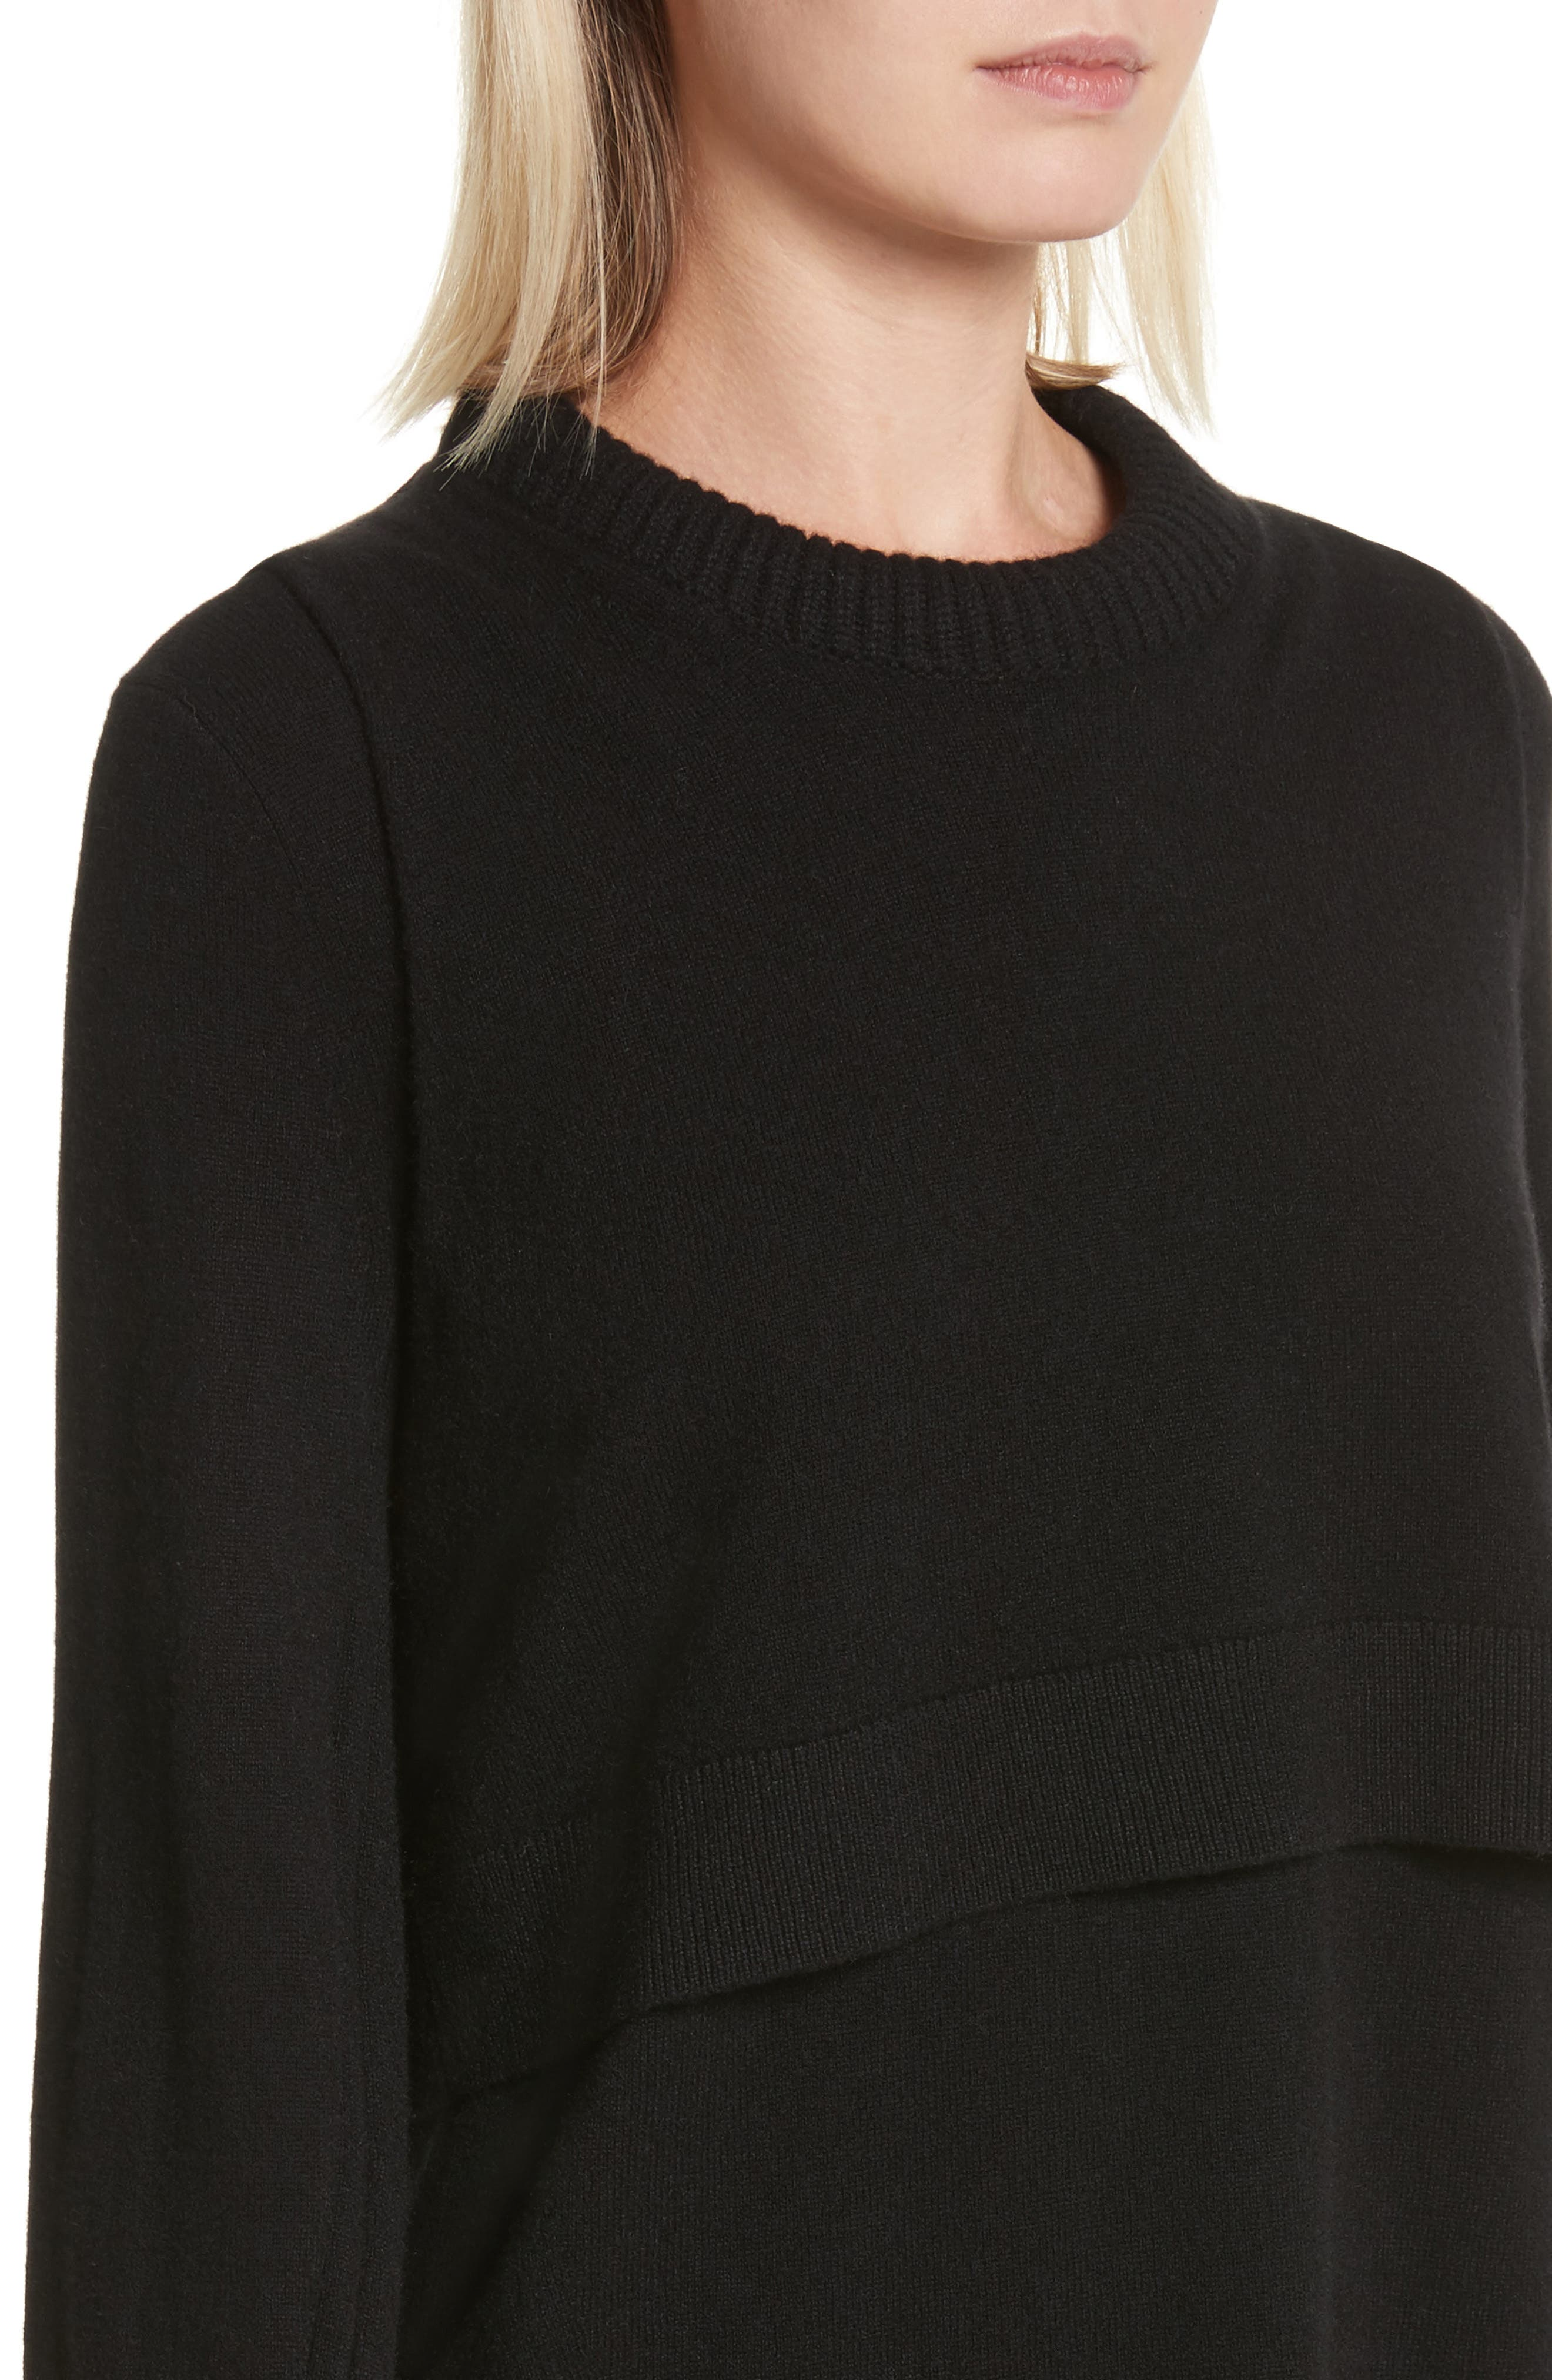 Preston Cashmere Crewneck Sweater,                             Alternate thumbnail 4, color,                             001